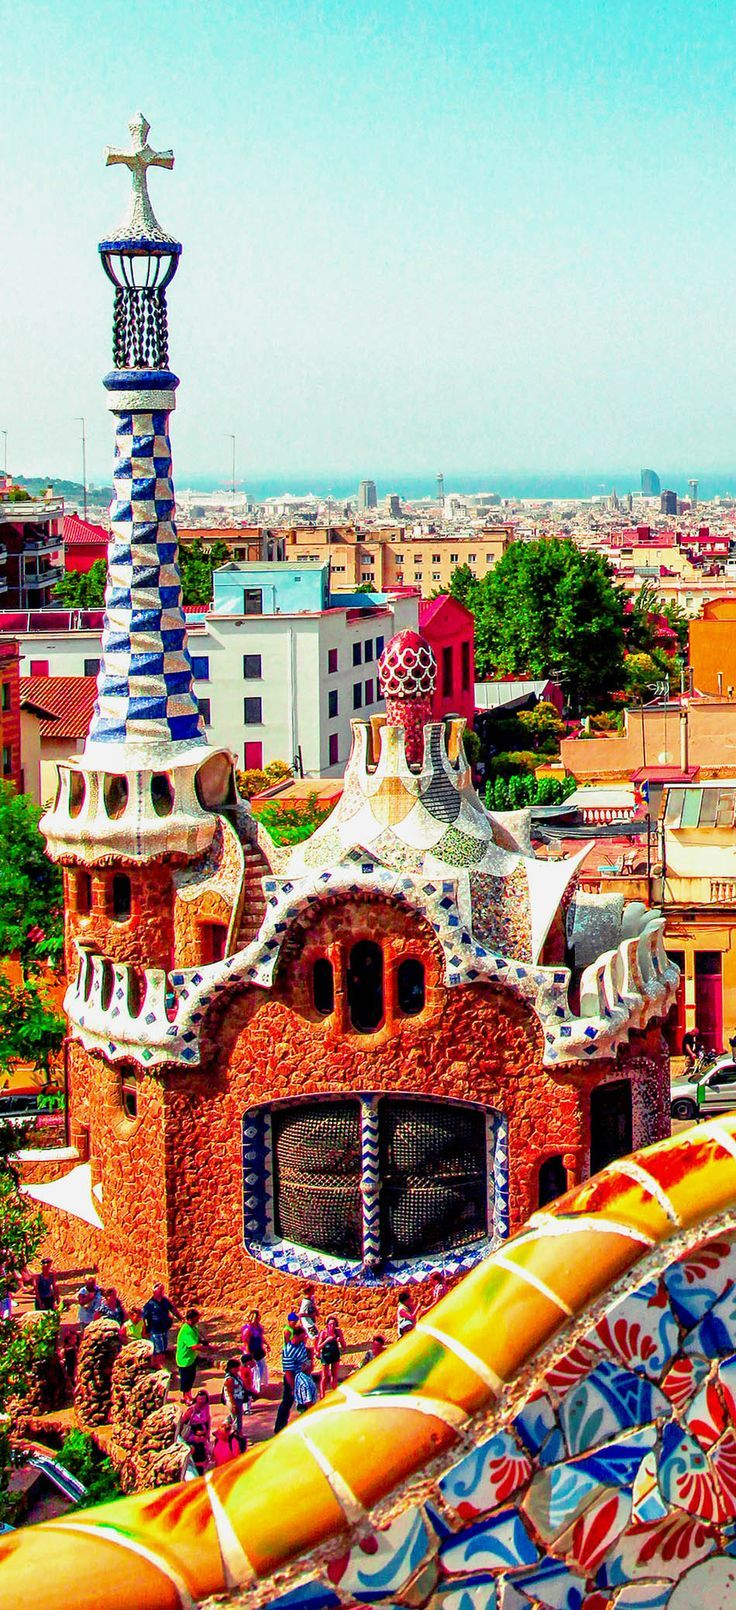 Vibrant and bold: Barcelona, Spain